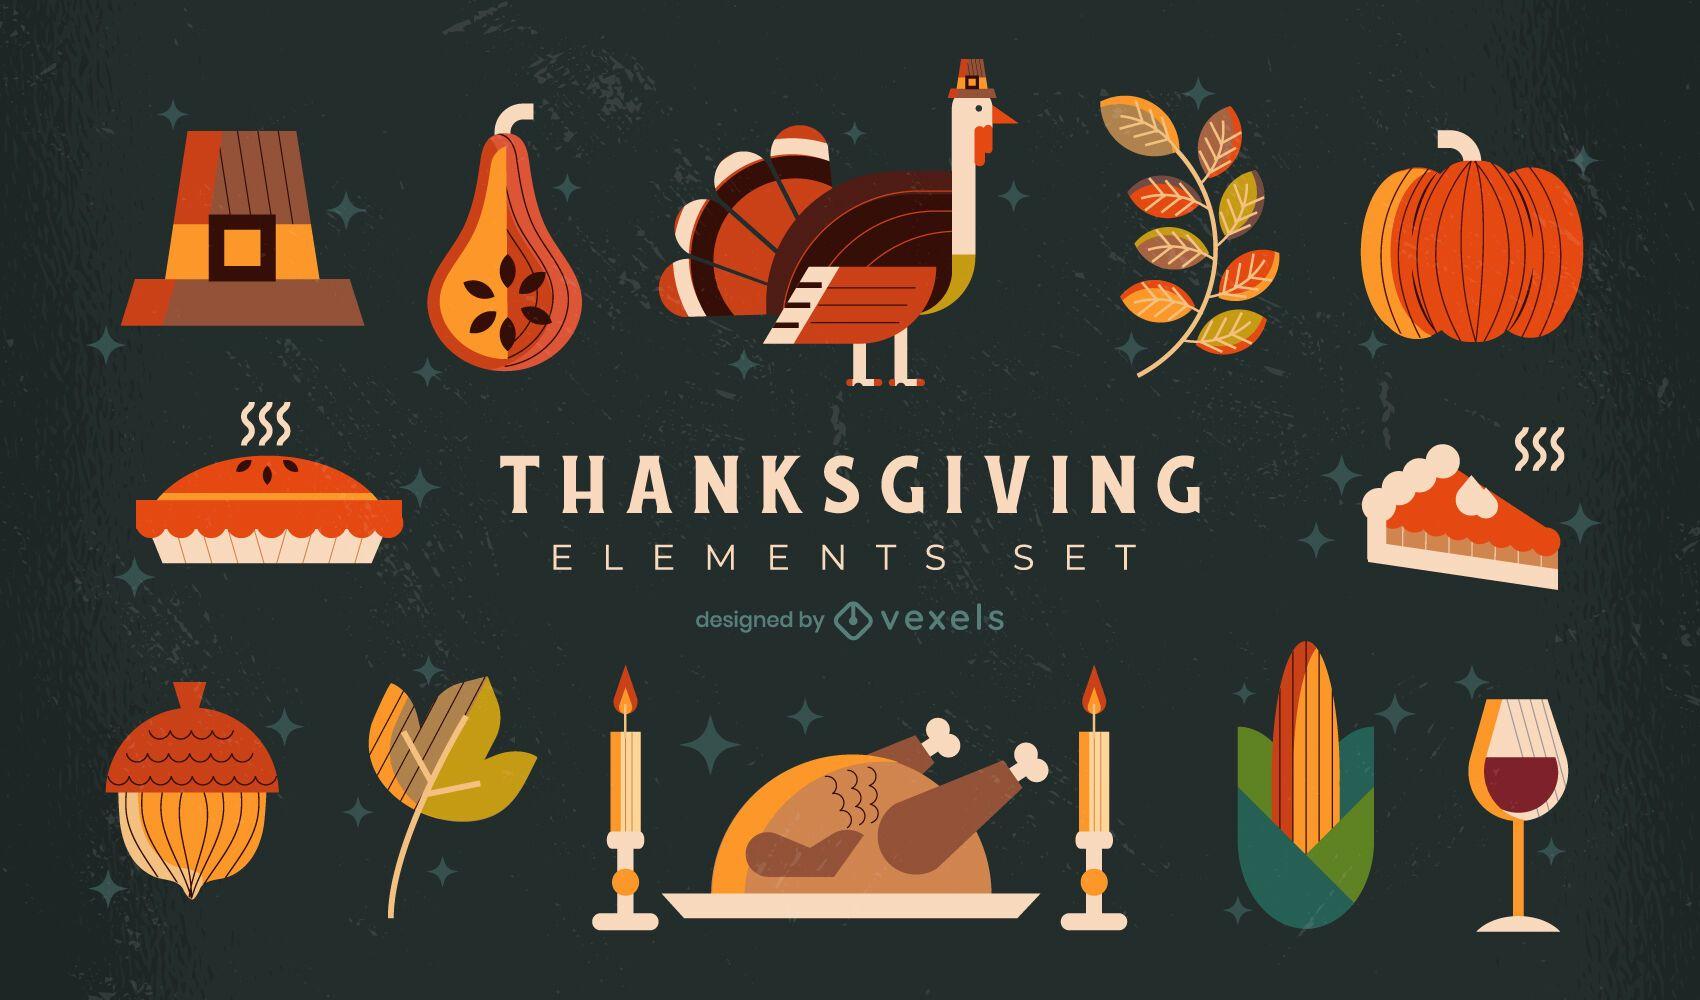 Thanksgiving elements illustration set